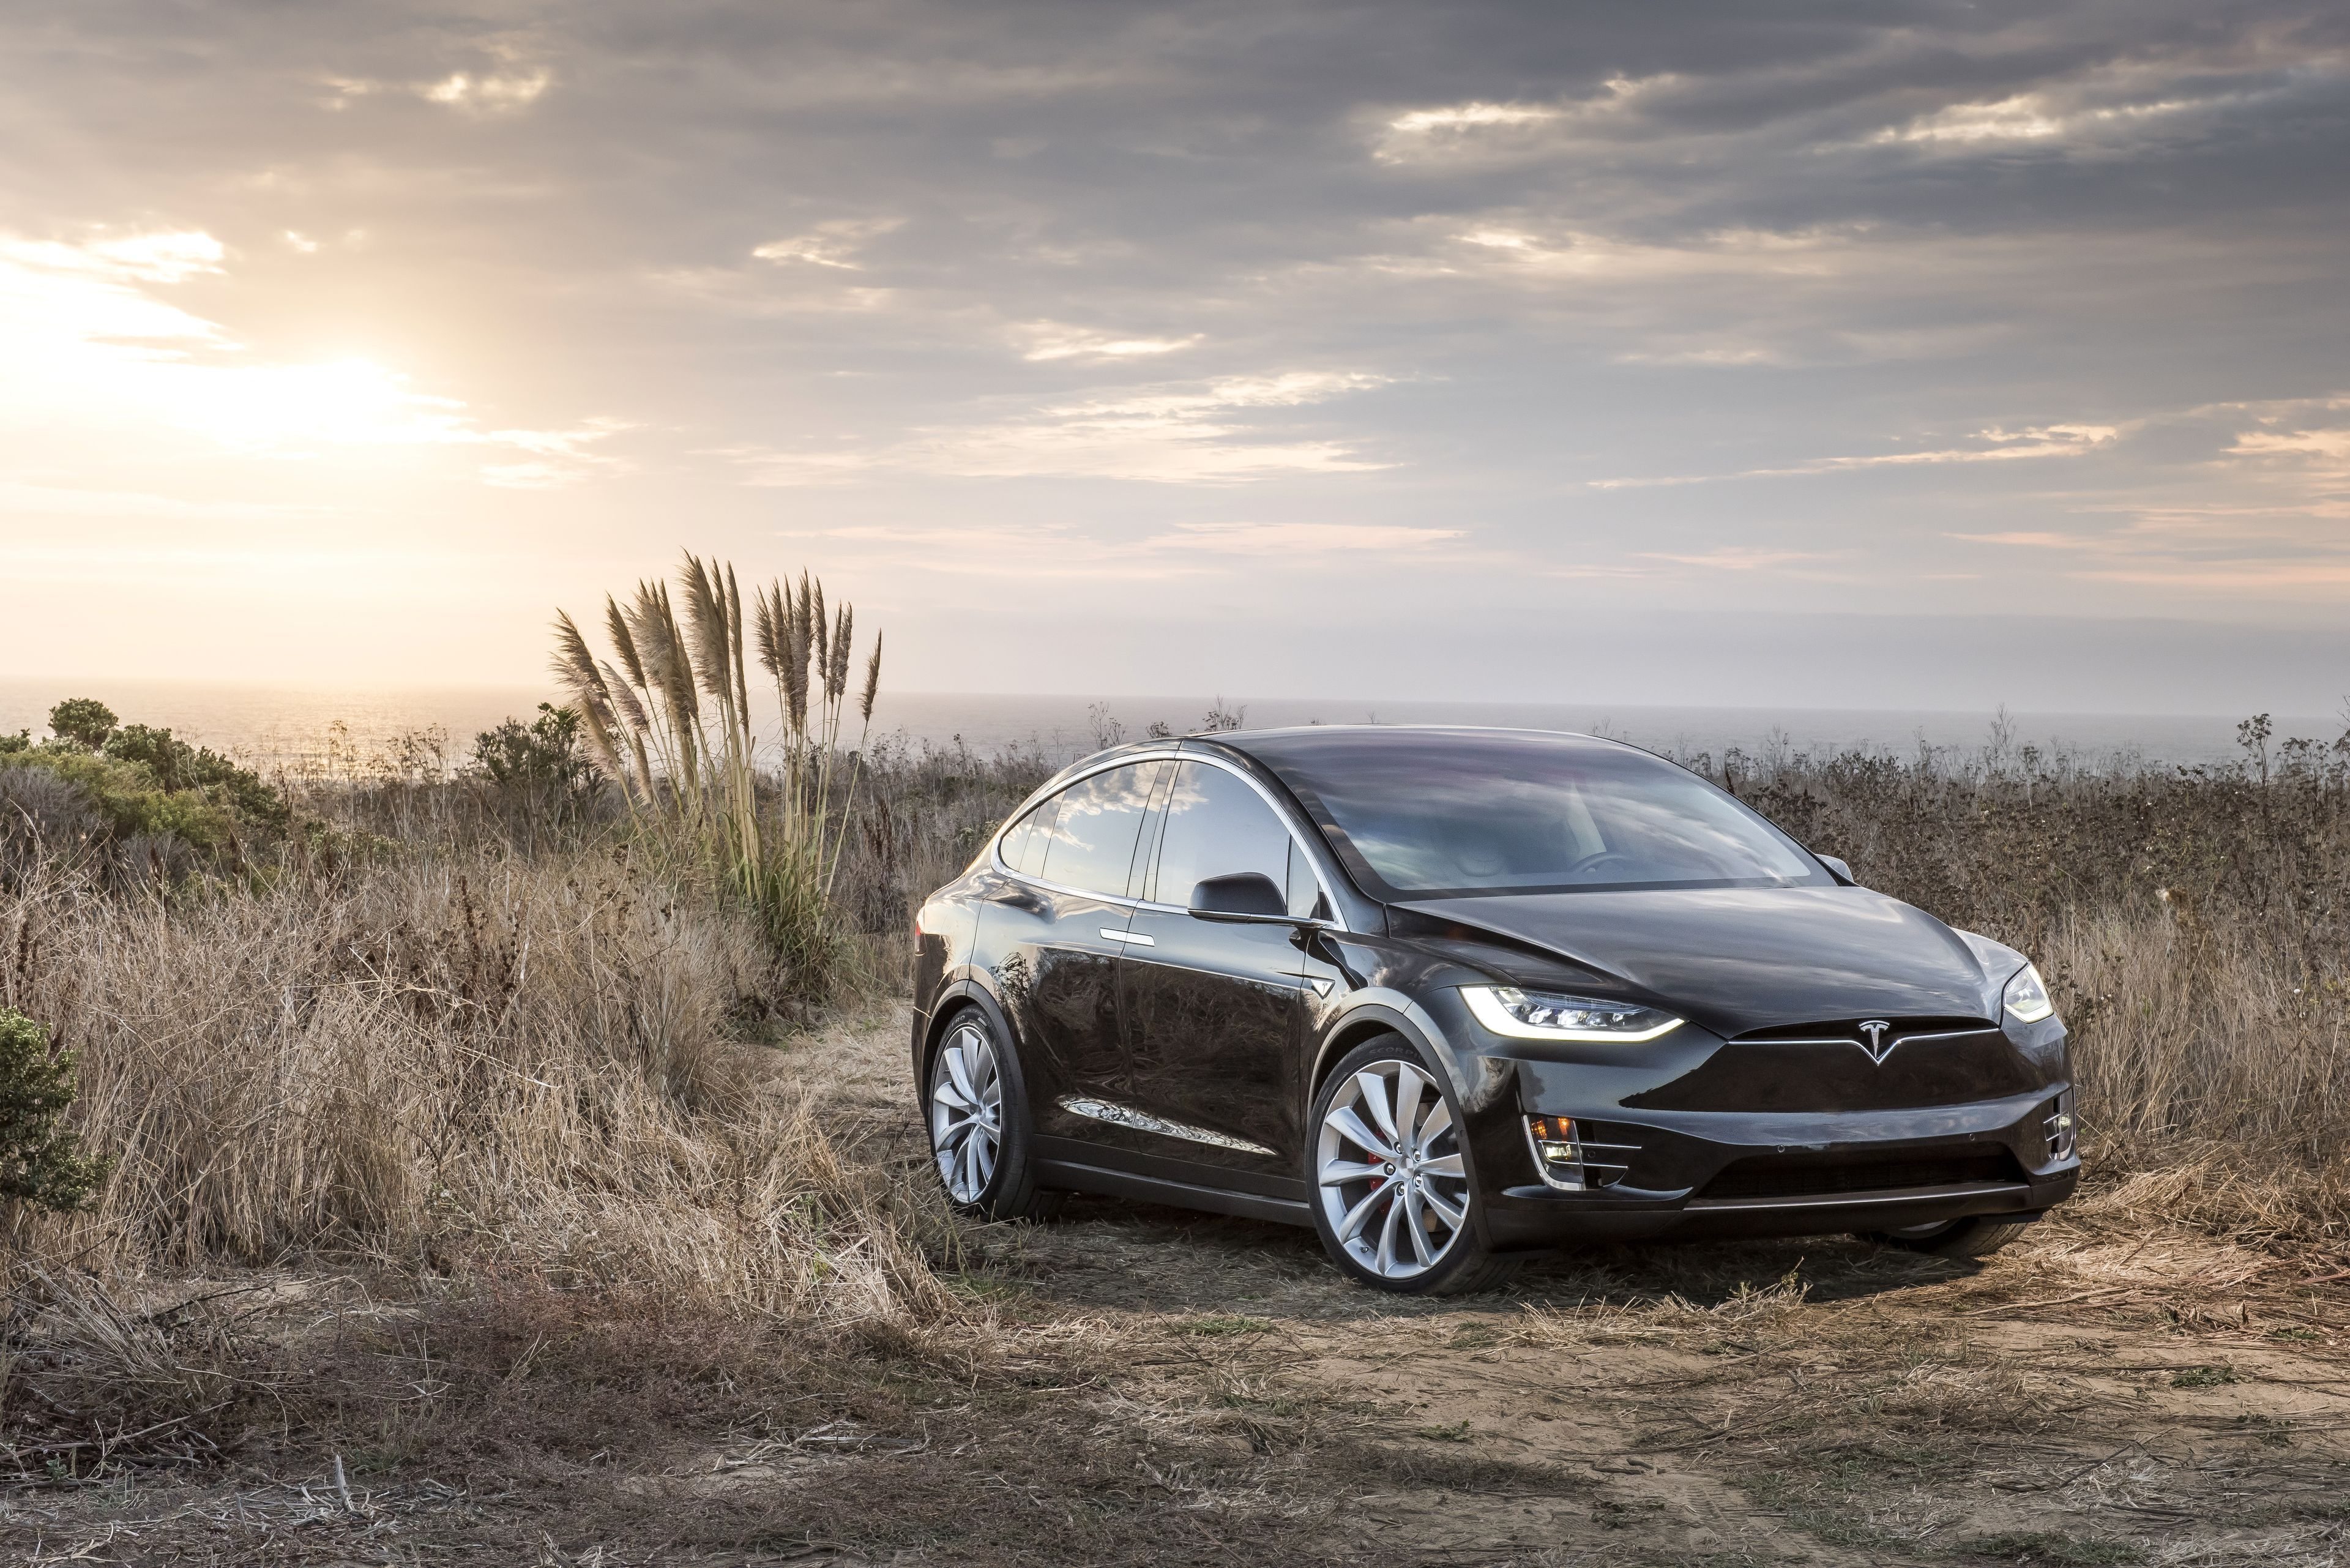 Tesla Model X Wallpapers   Top Tesla Model X Backgrounds 3840x2562